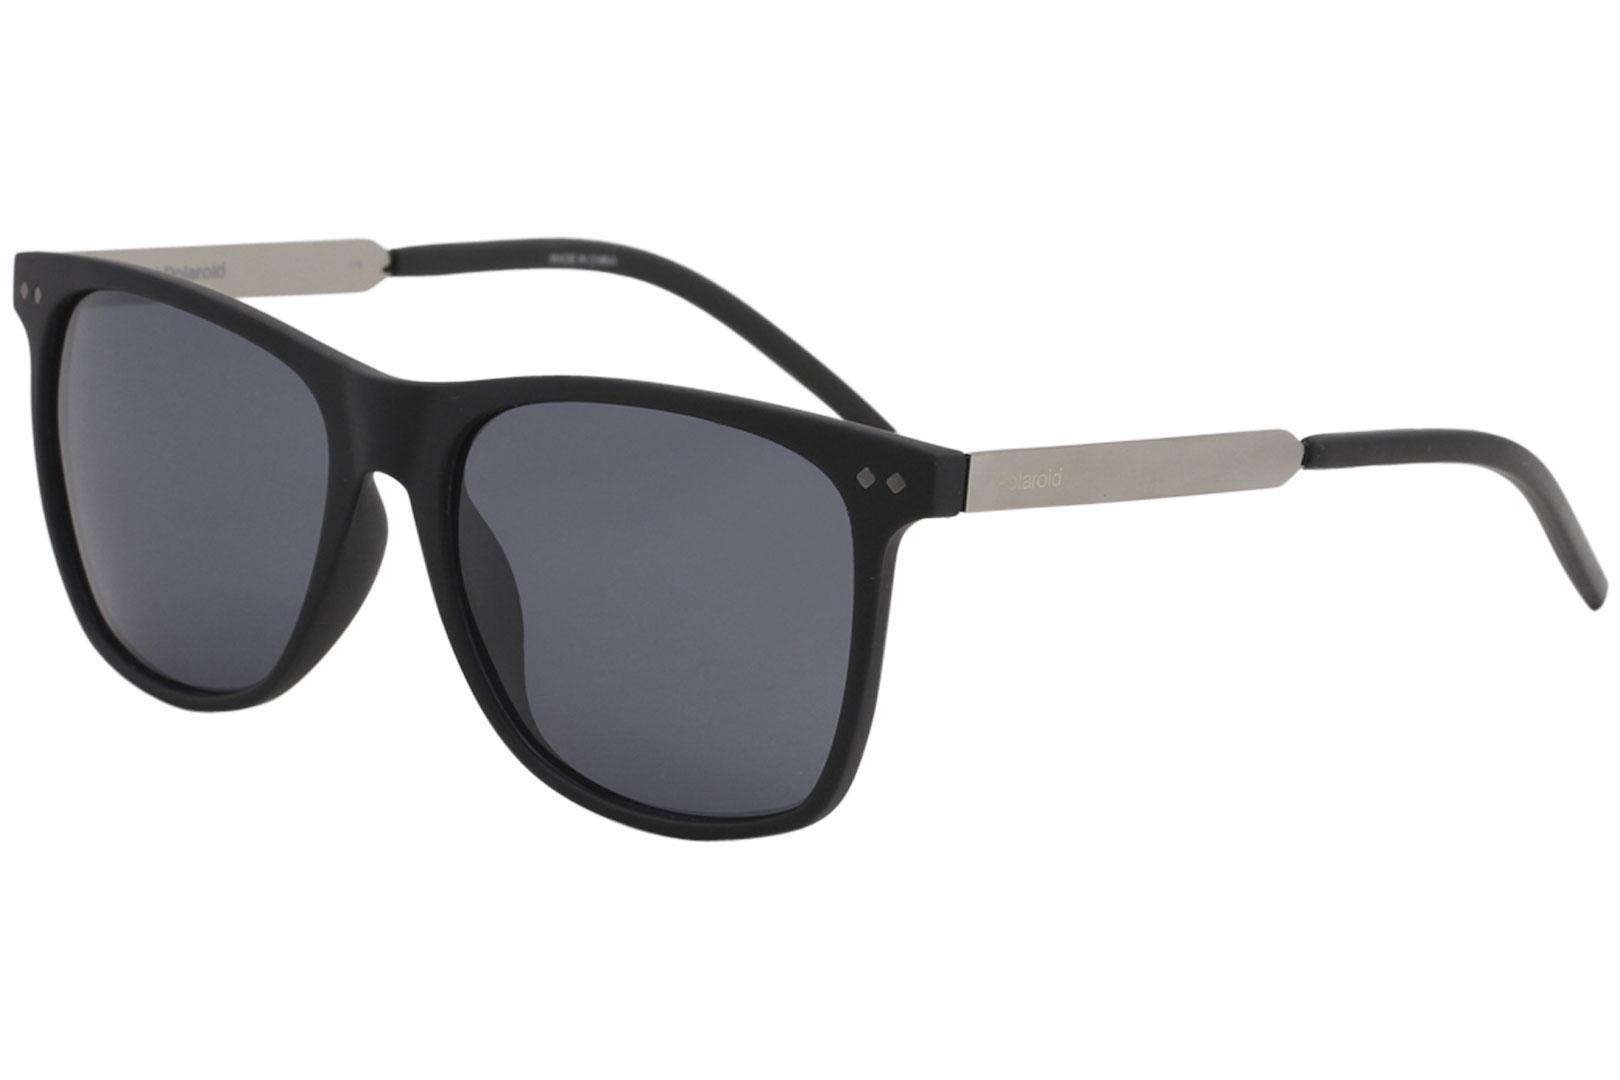 3612c4b2d44 Polaroid PLD1028S PLD 1028 S Fashion Square Polarized Sunglasses by  Polaroid. Touch to zoom